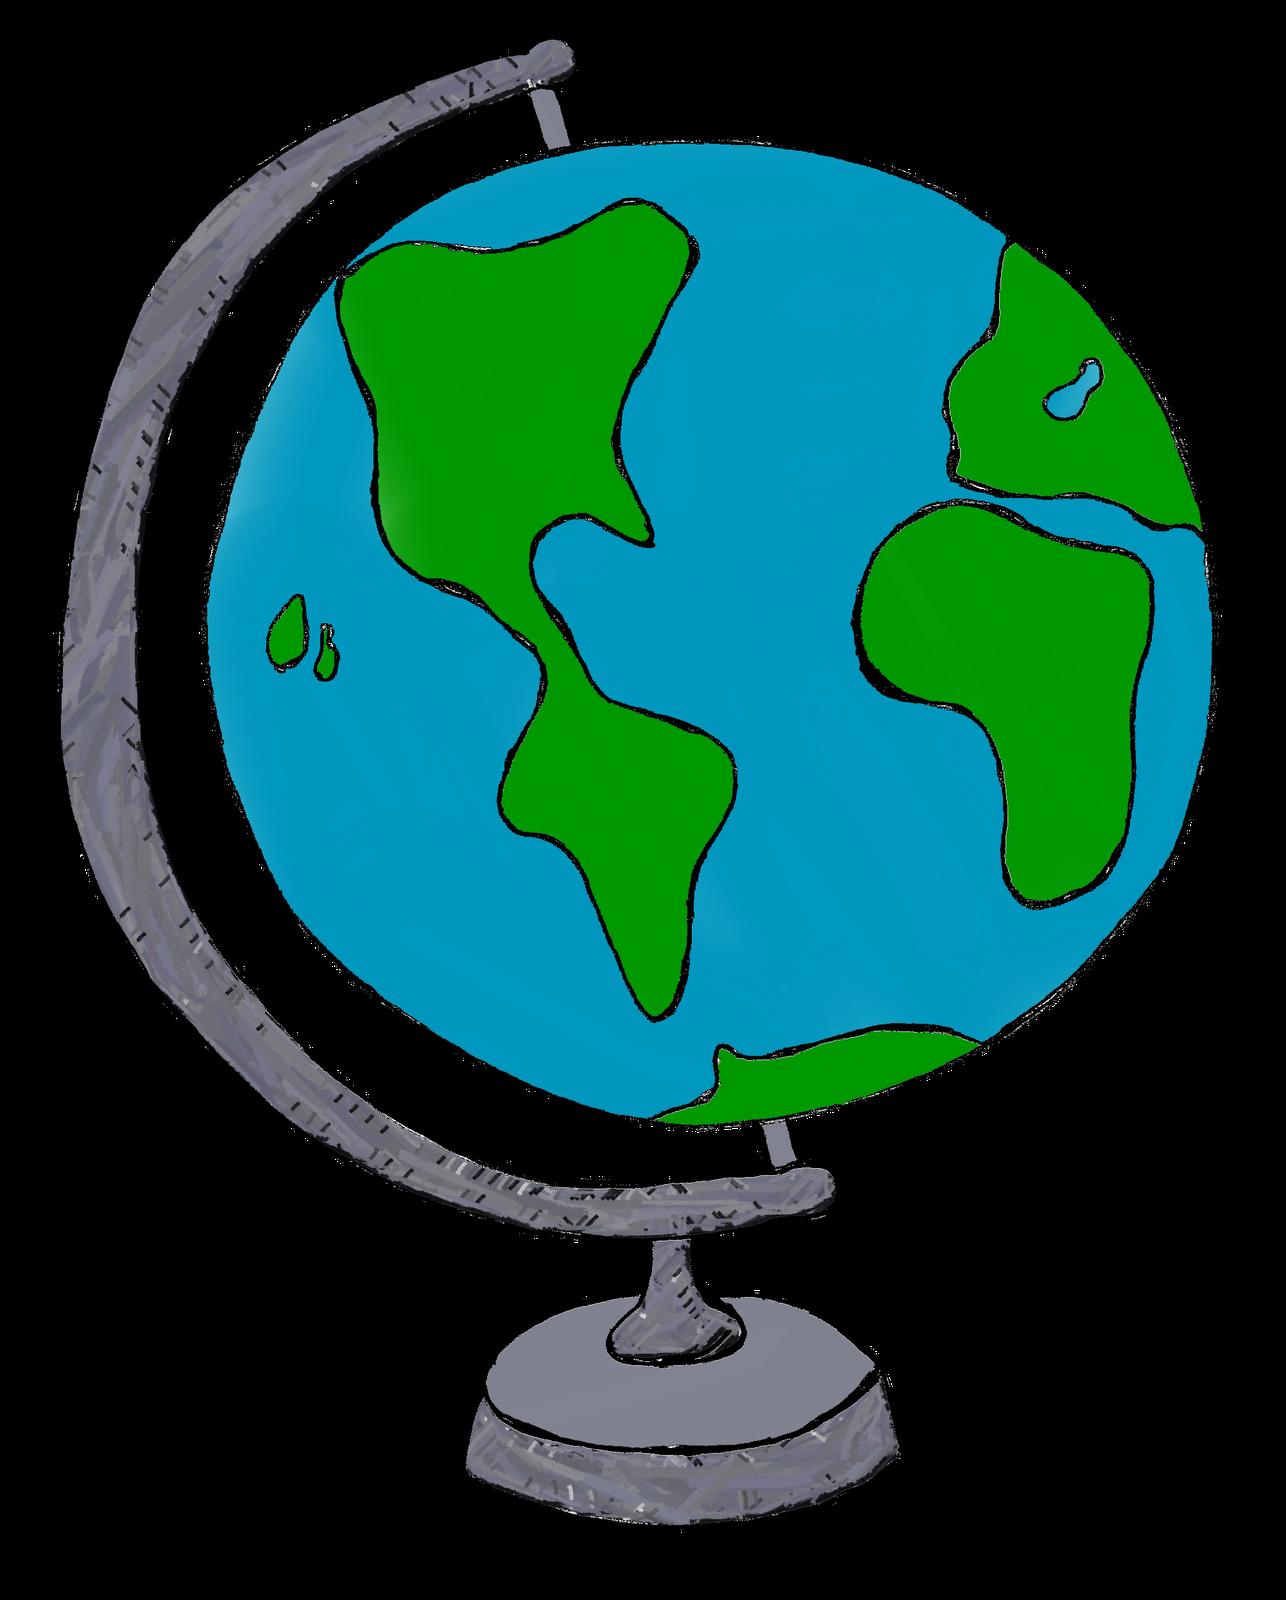 Globe clipart #5